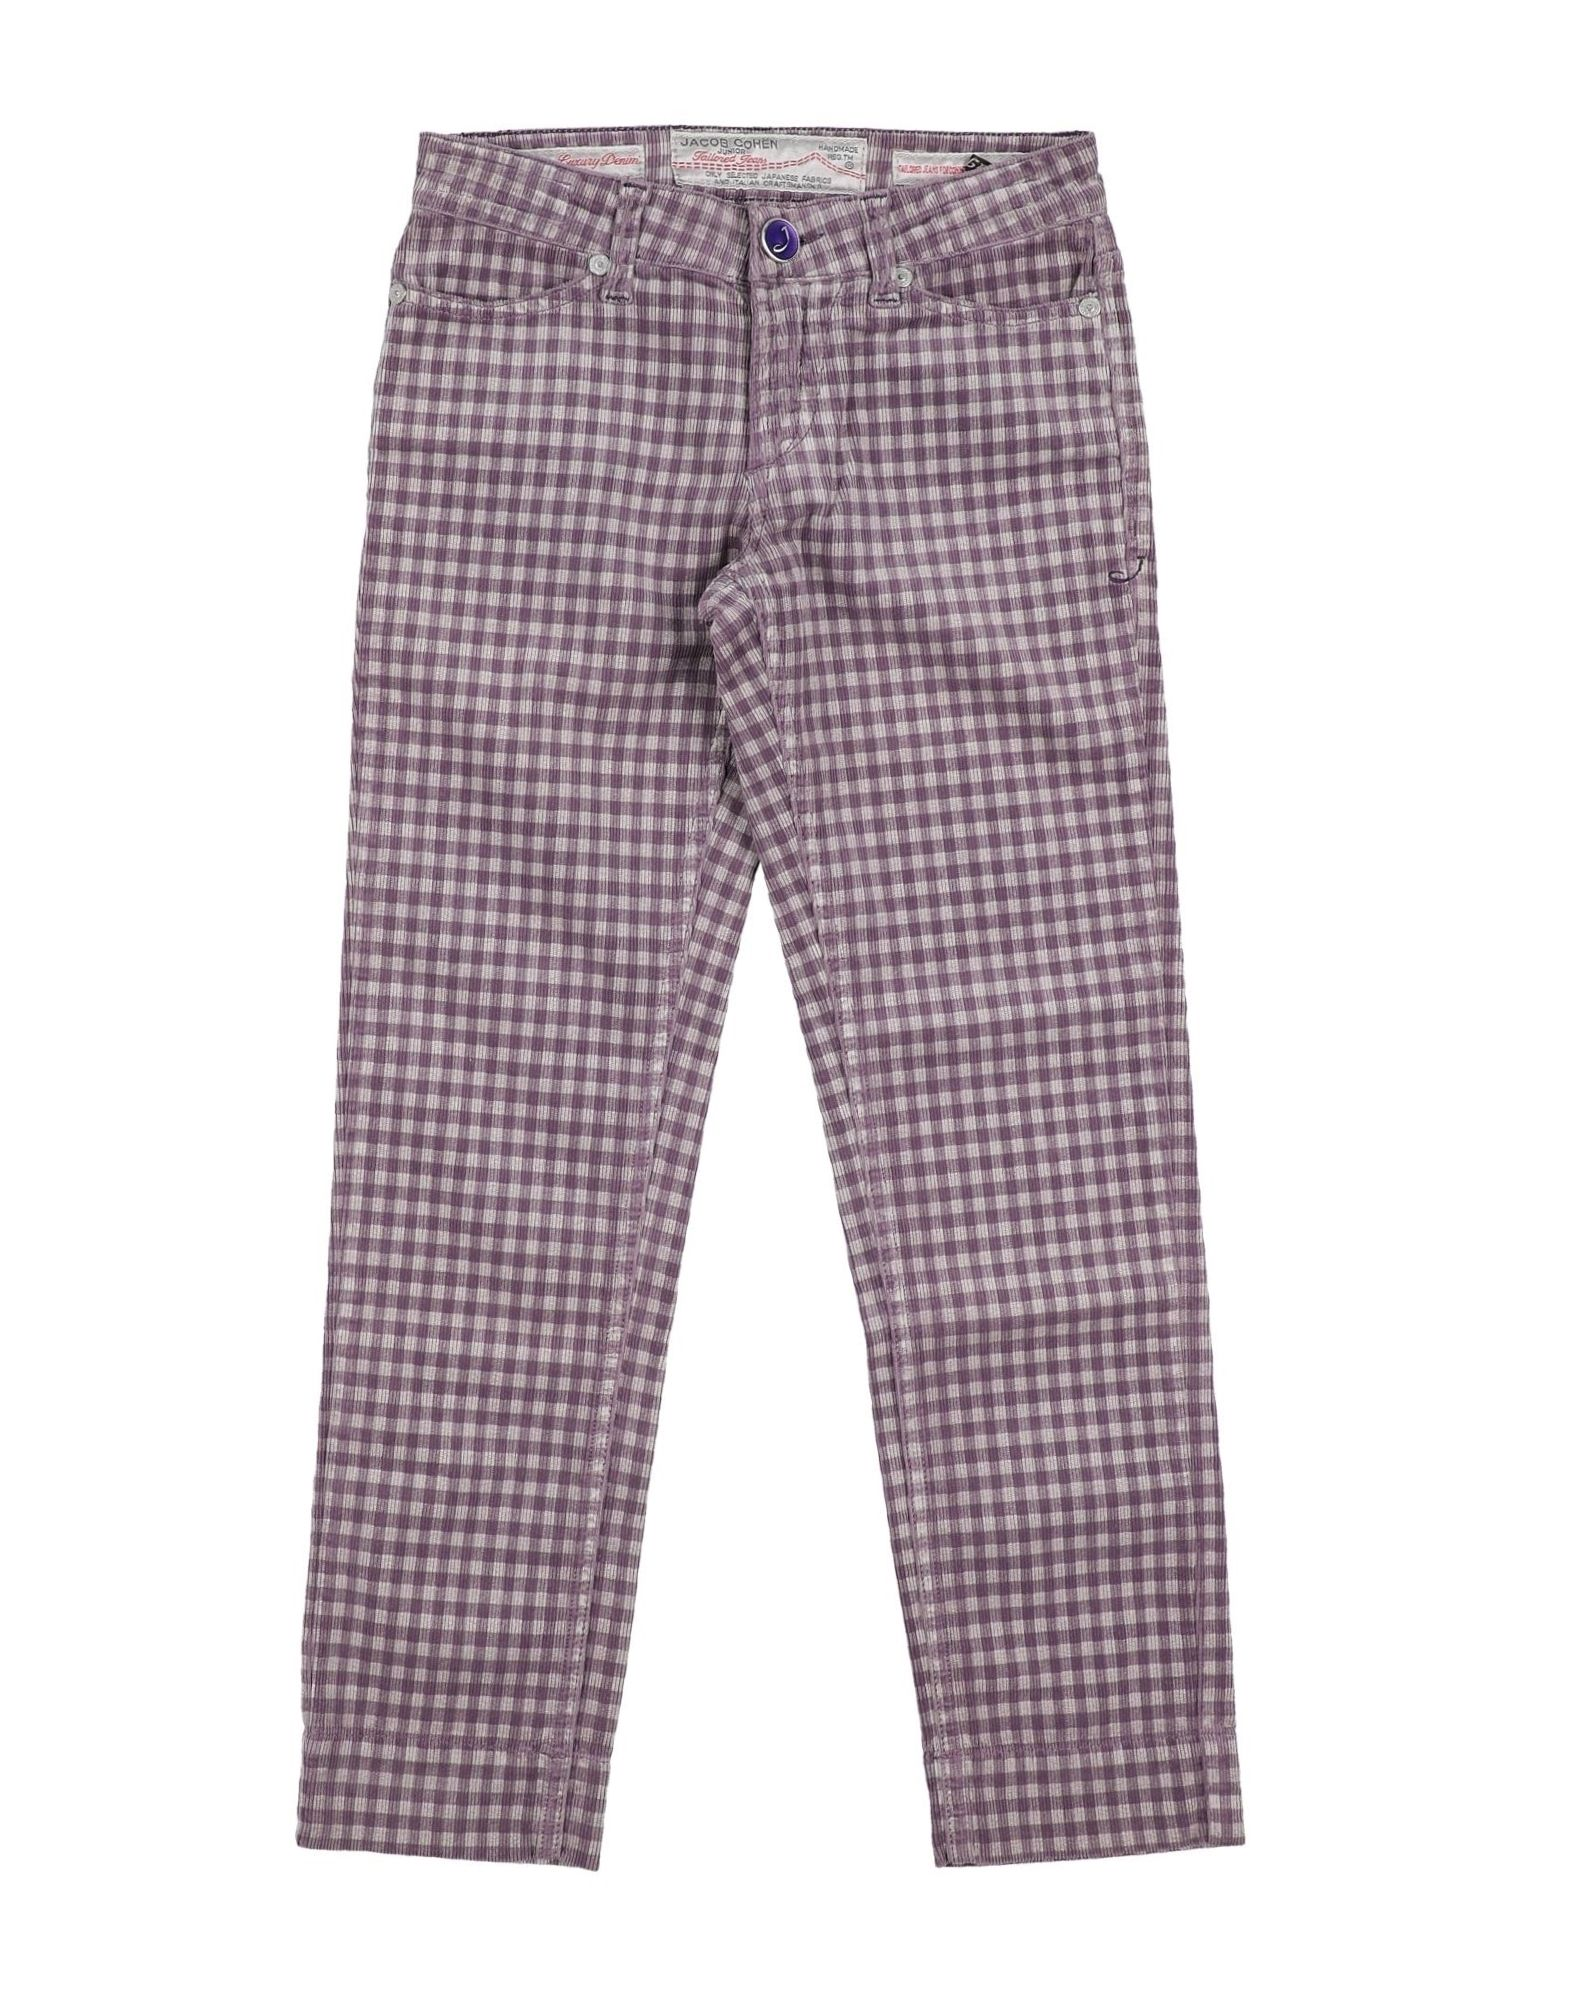 Jacob Cohёn Kids' Casual Pants In Gray